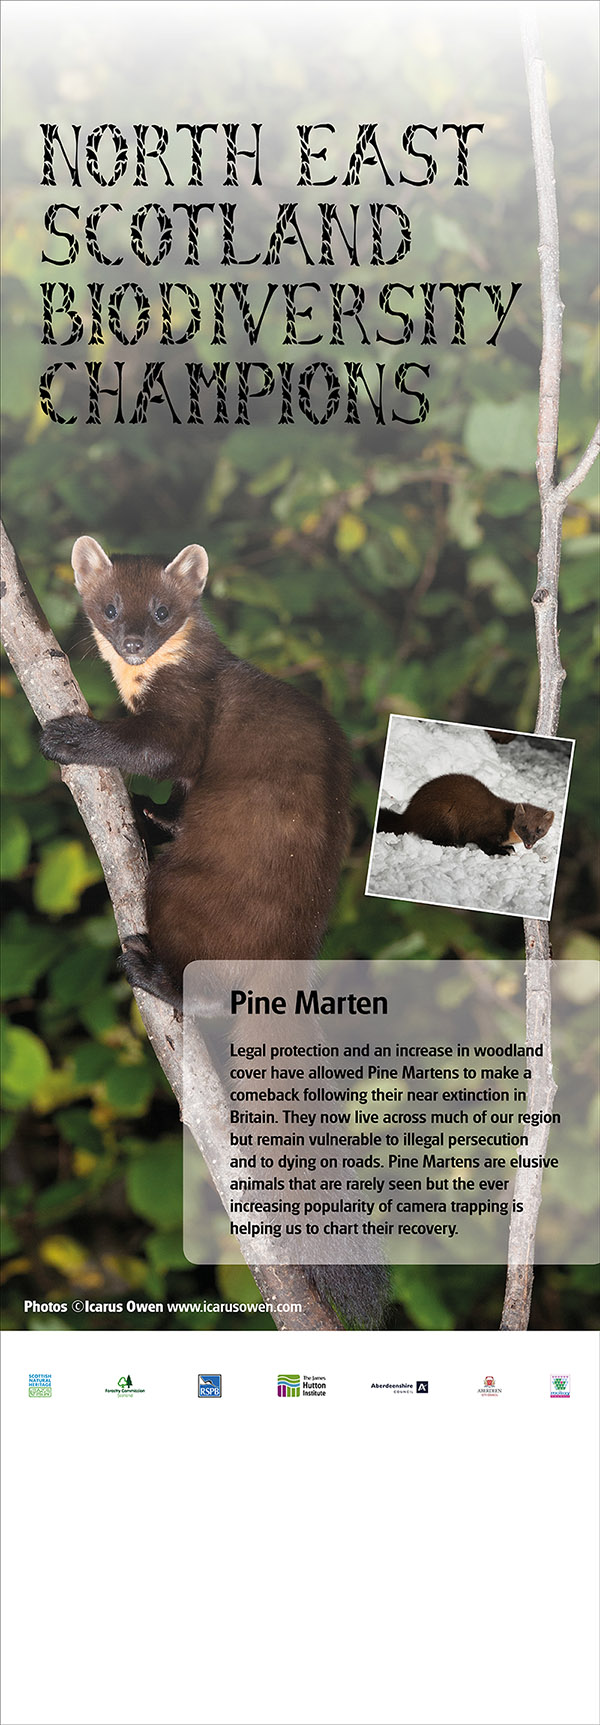 Pine marten images on North East Biodiversity Partnership pull-up